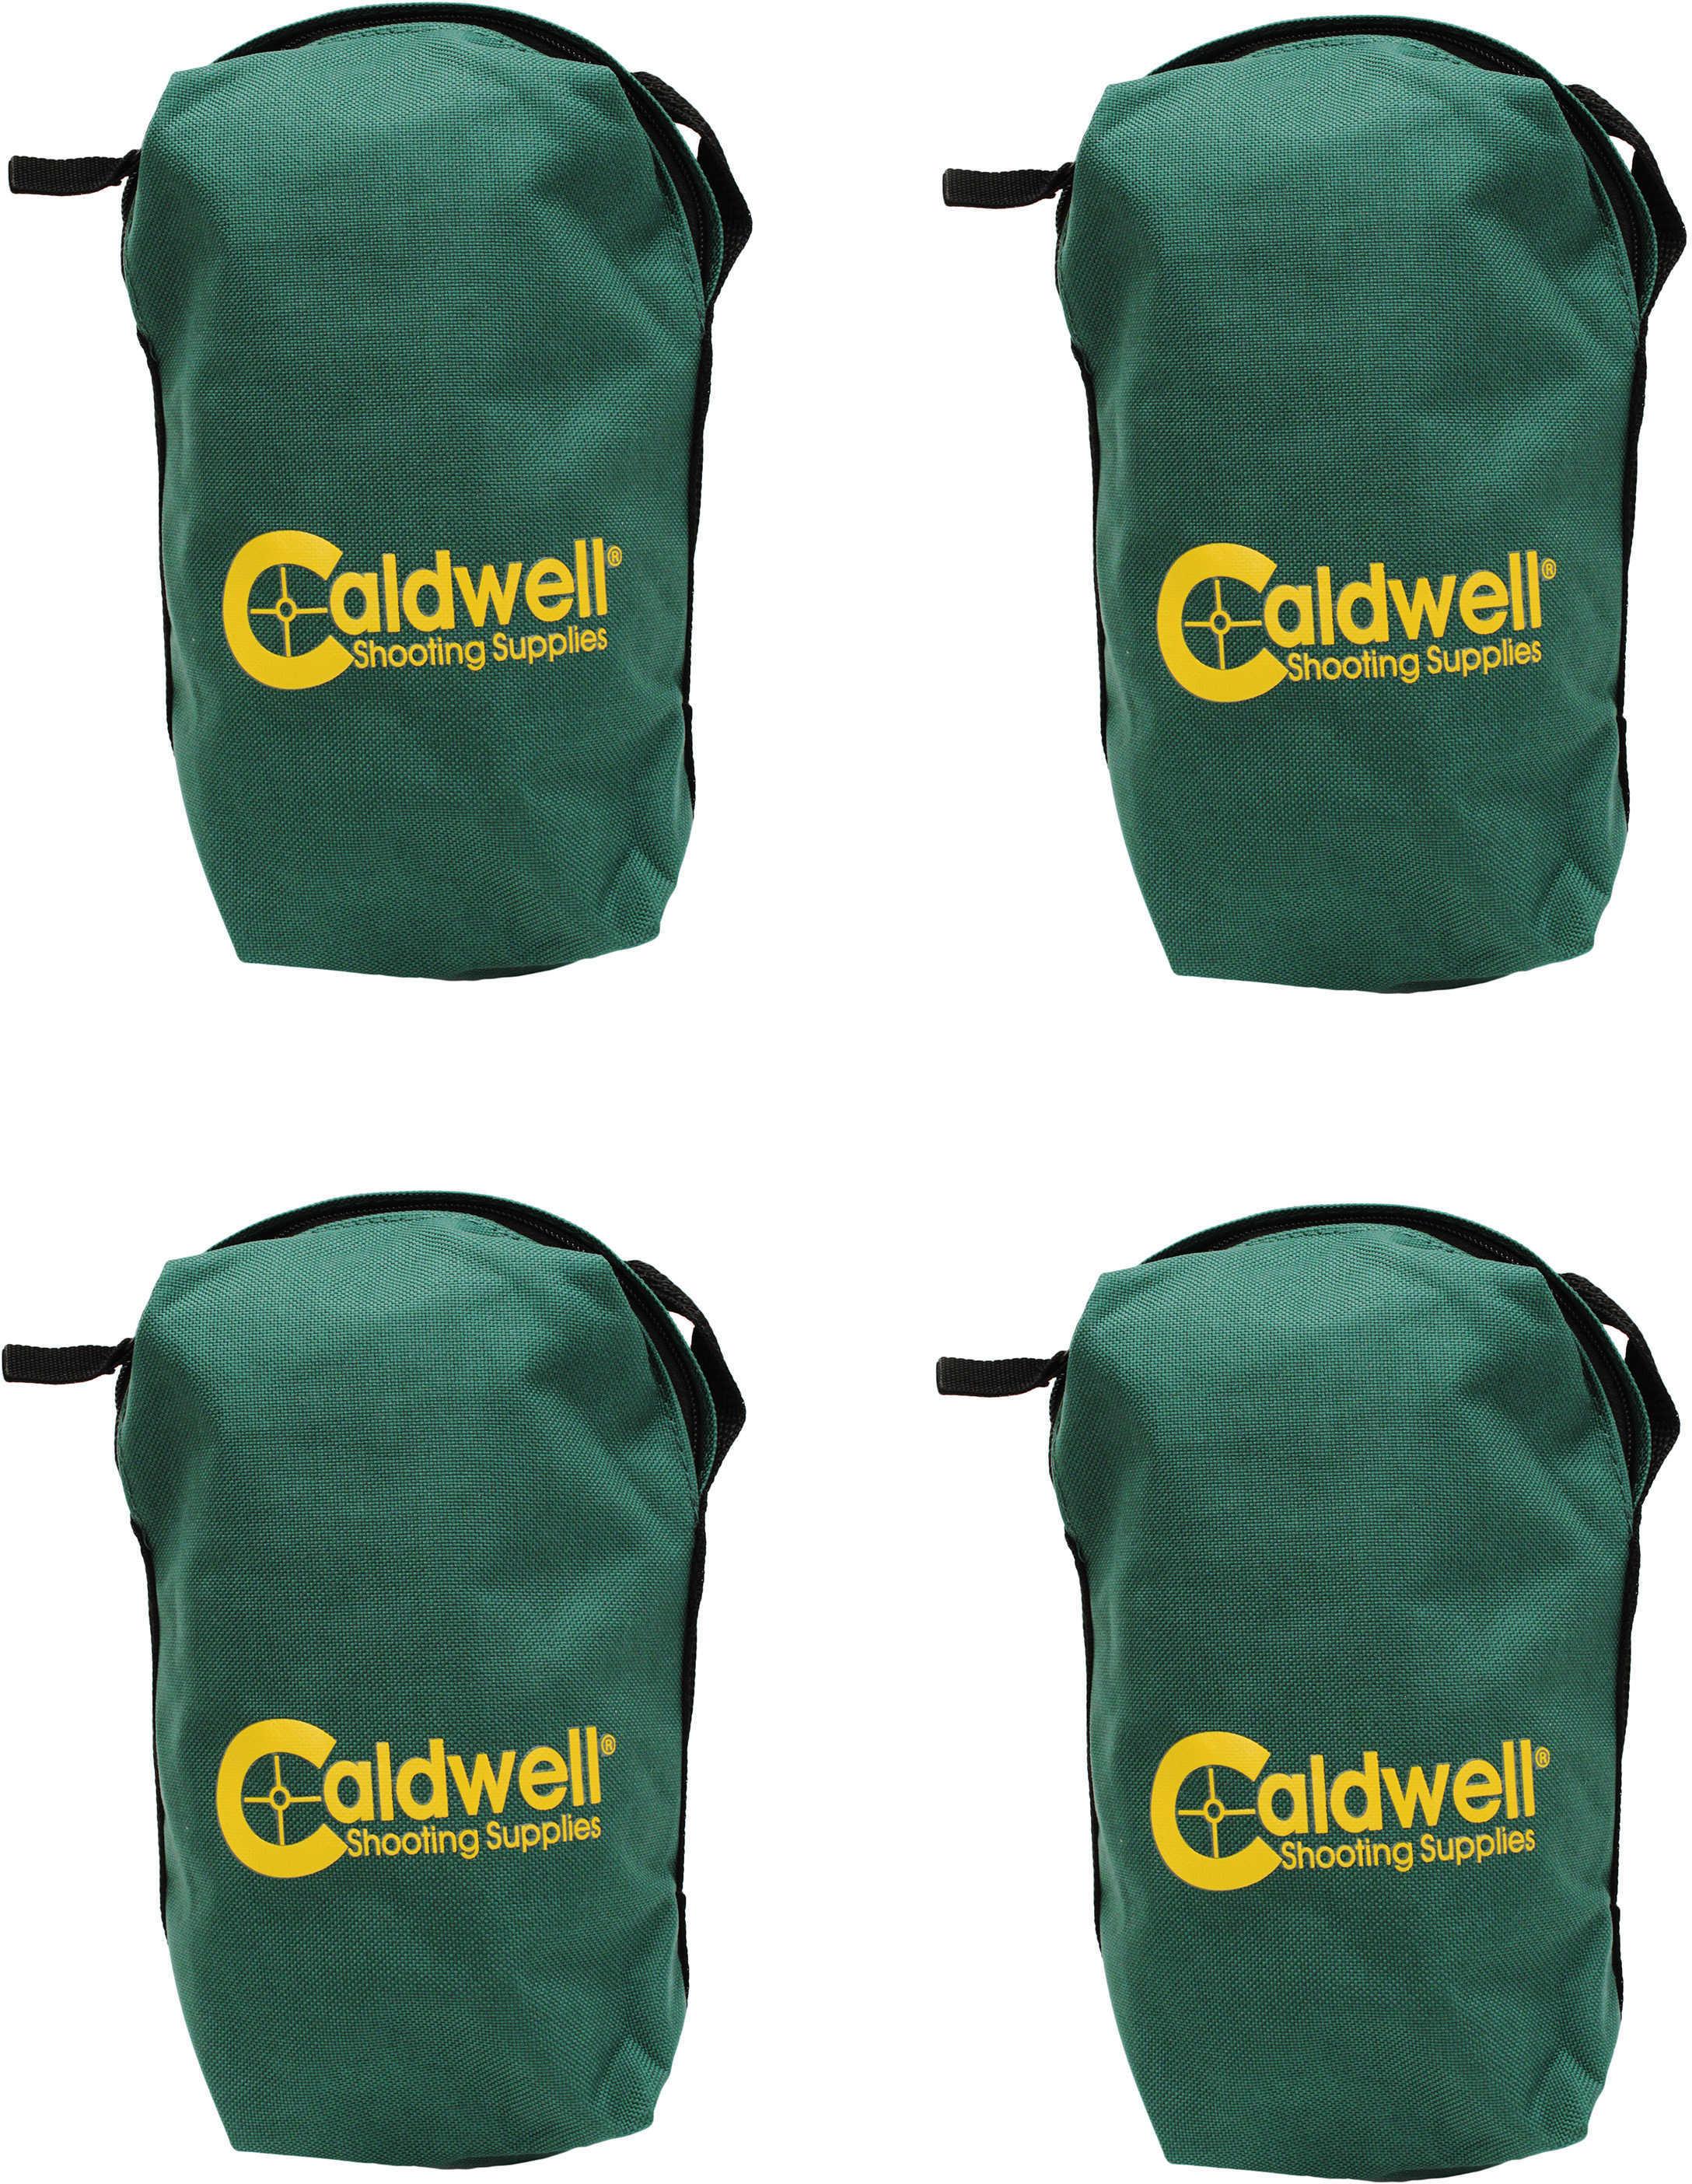 Caldwell Lead Sled Shot Carrier Bag, 4 Pack Md: 533-117